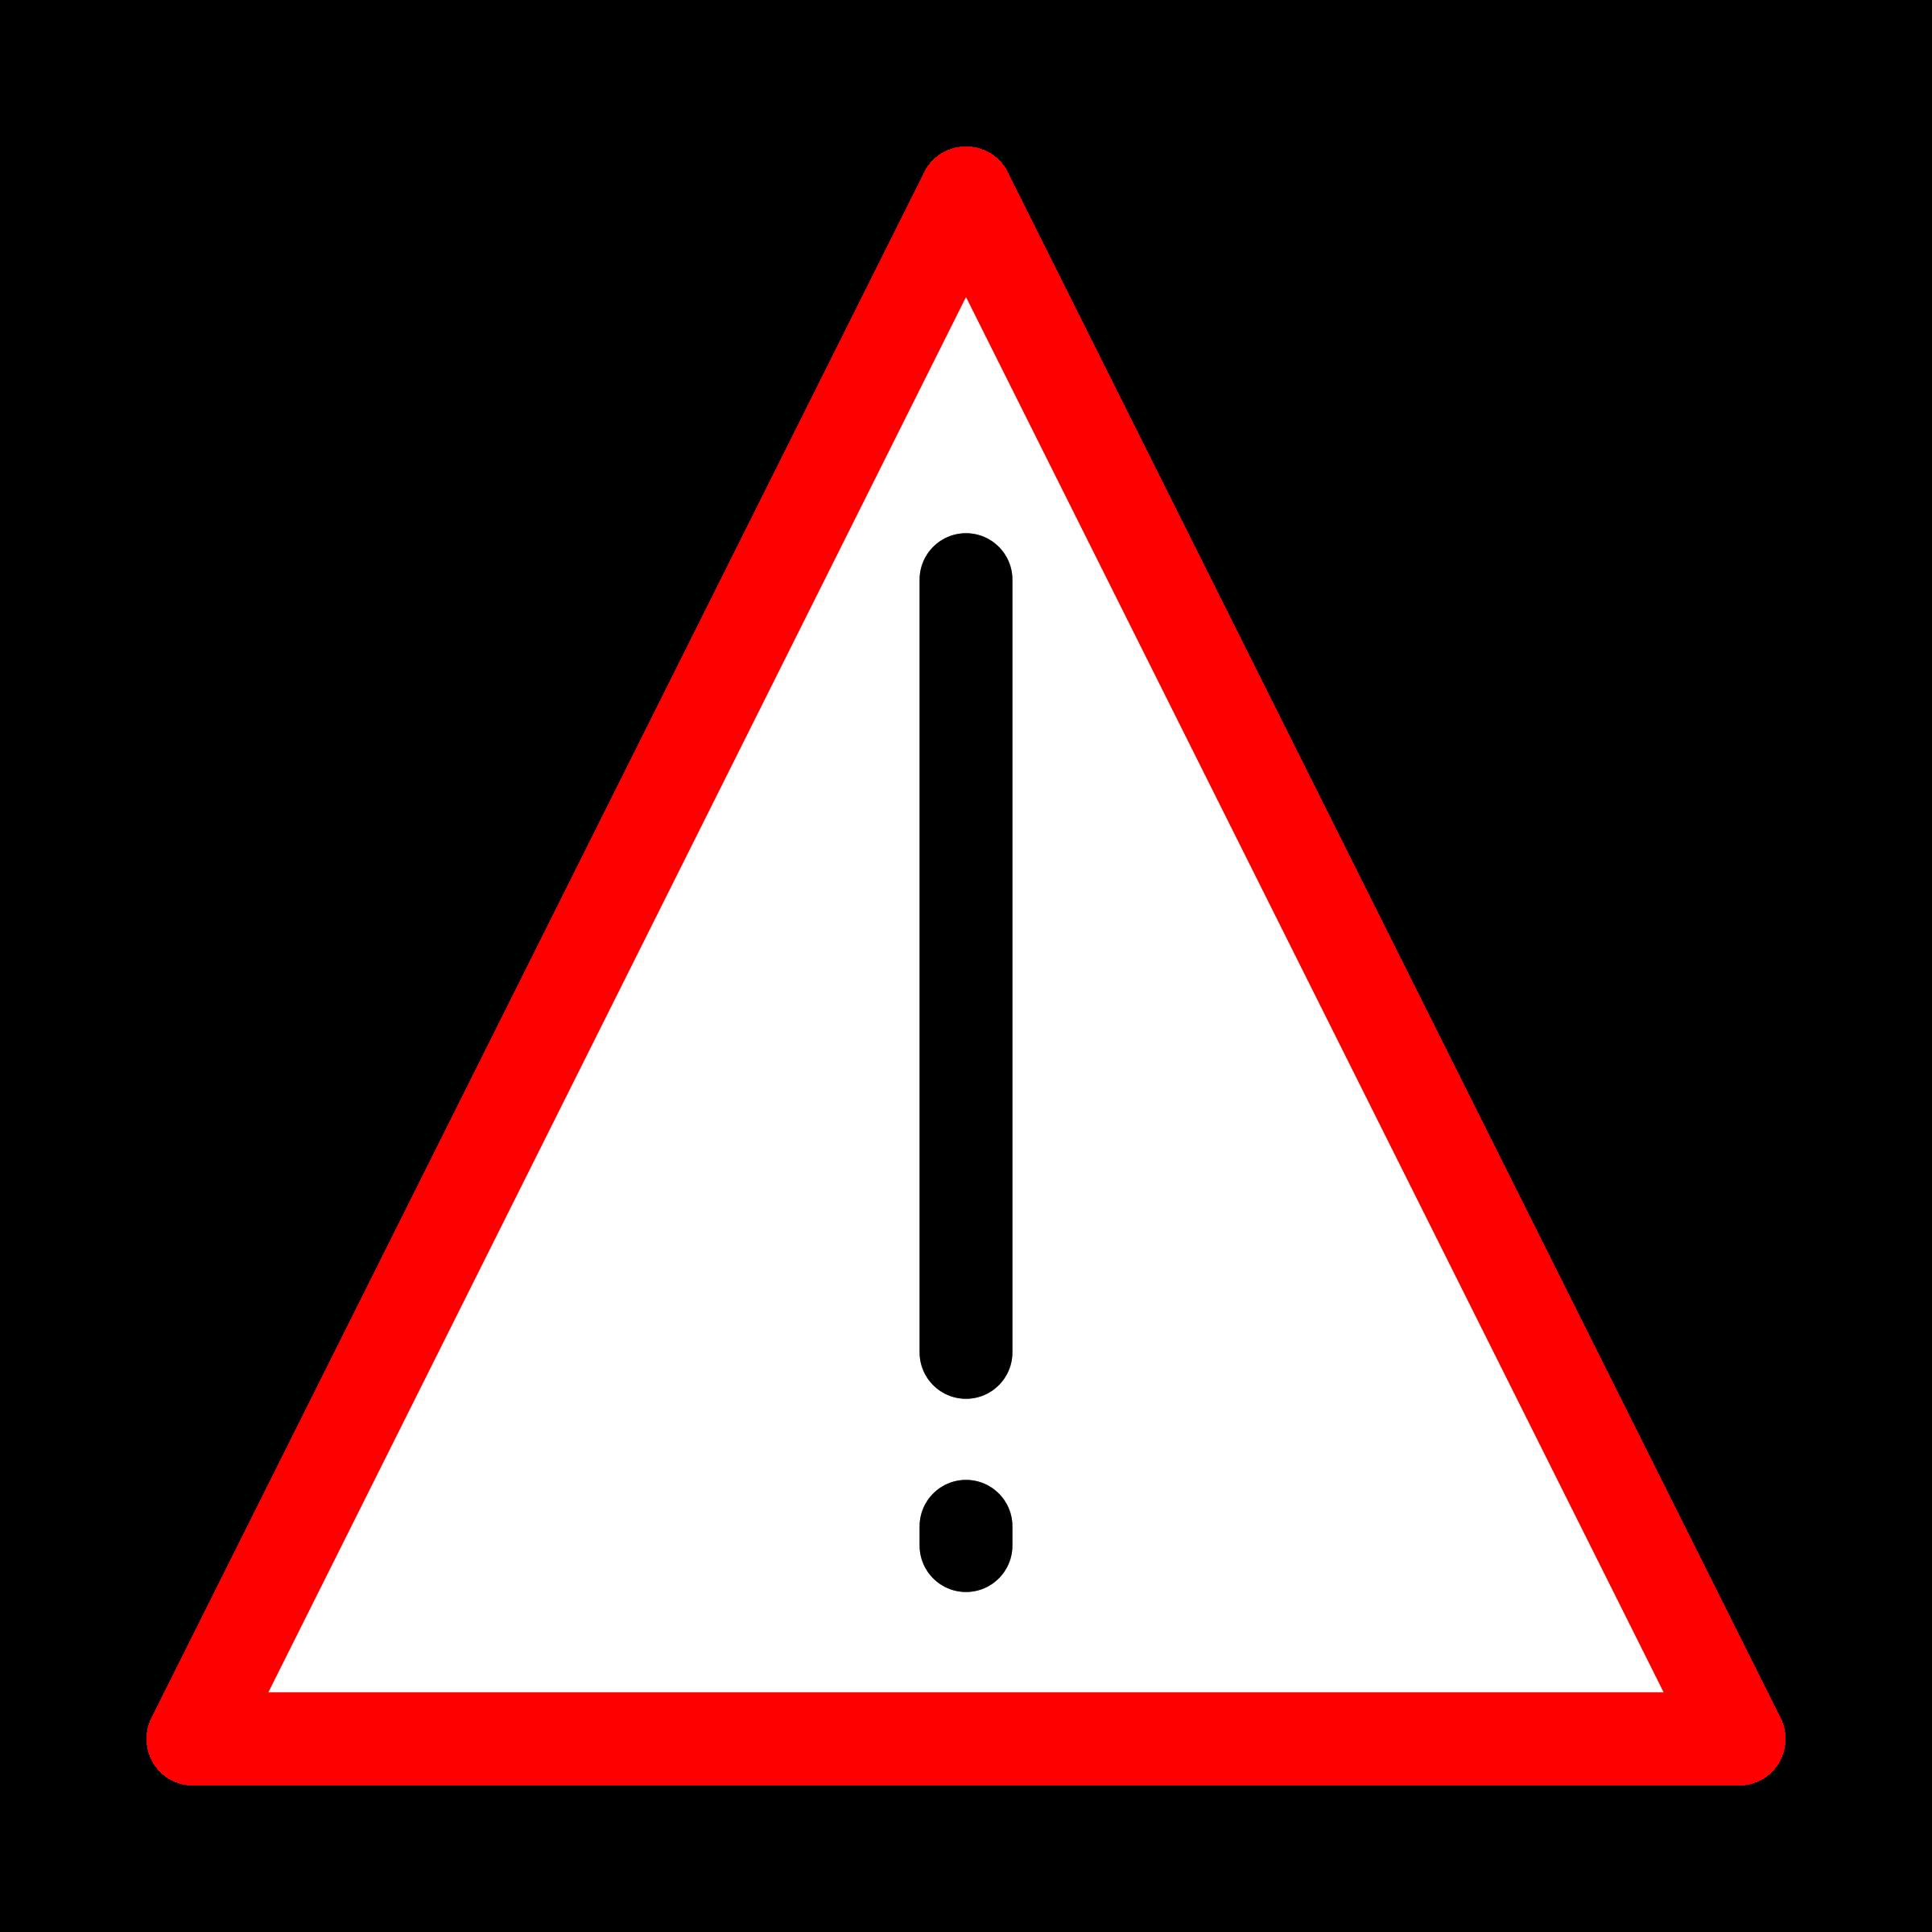 Sign big image png. Triangular clipart warning